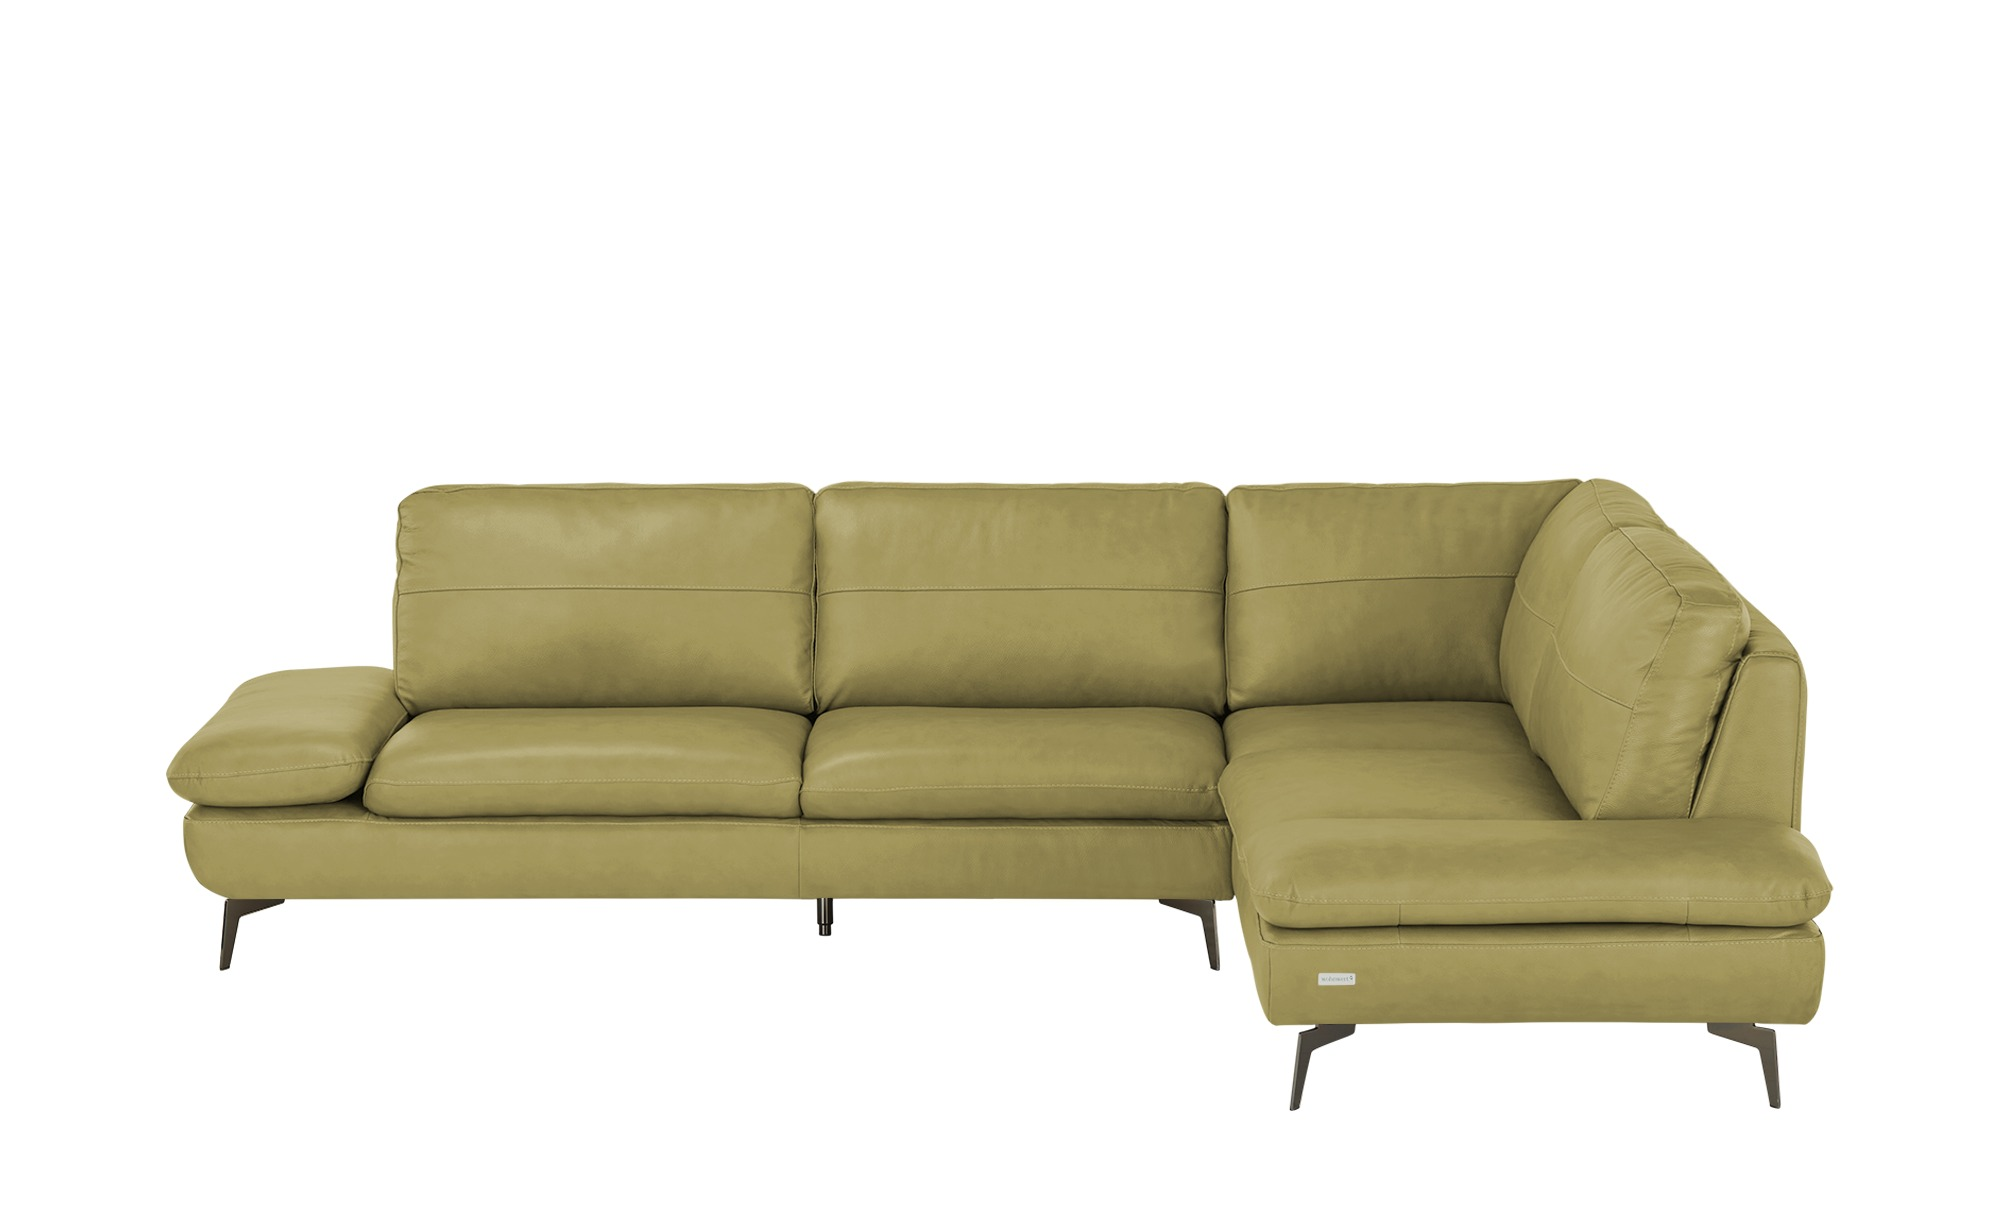 Wohnwert Ecksofa  Amarena ¦ grün ¦ Maße (cm): B: 292 H: 84 T: 210 Polstermöbel > Sofas > Ecksofas - Höffner